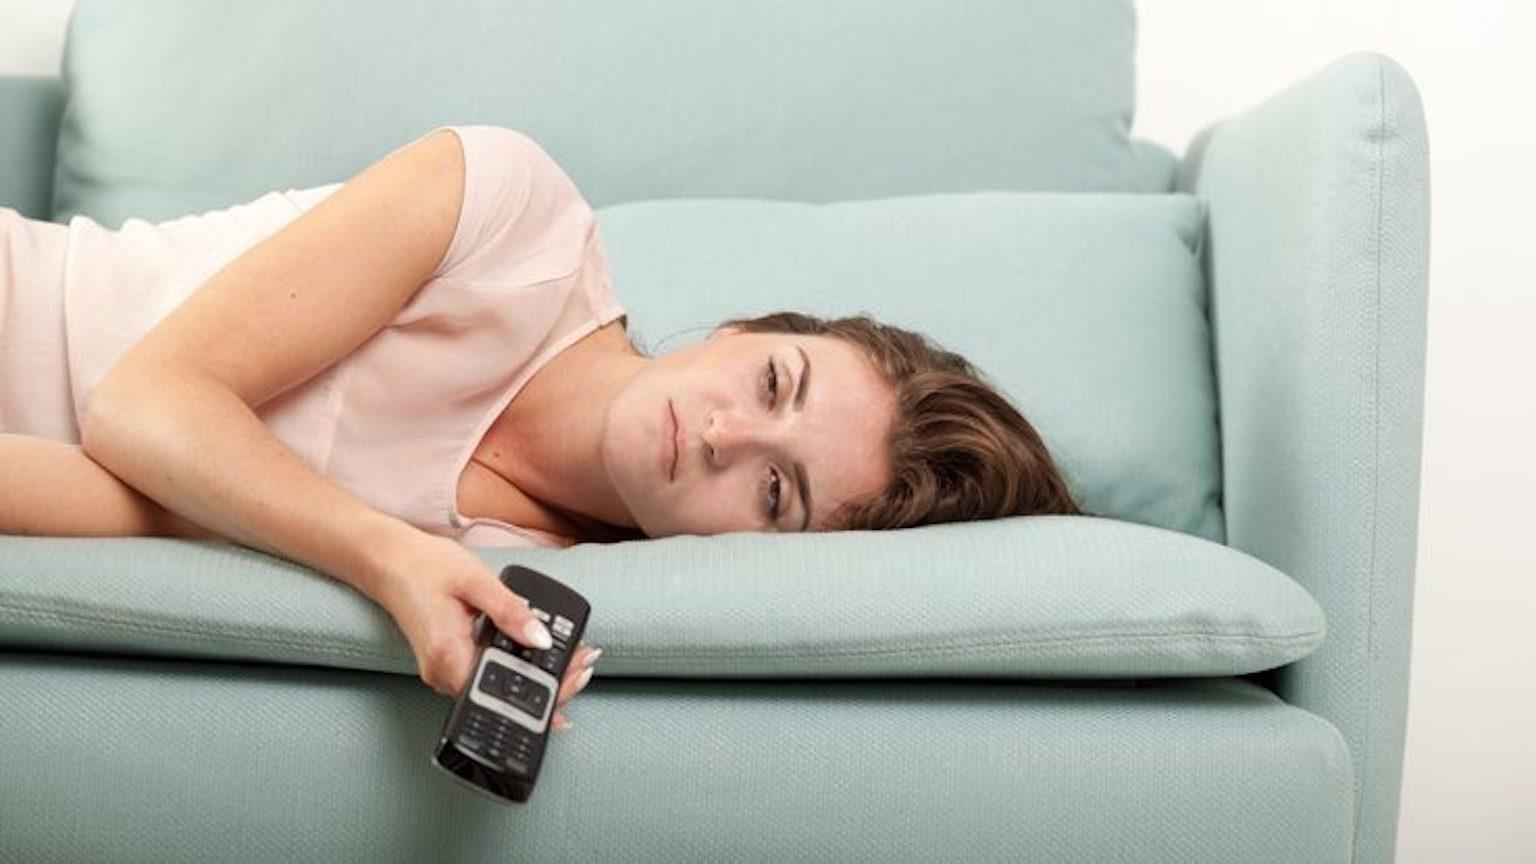 Bored woman on sofa watching TV